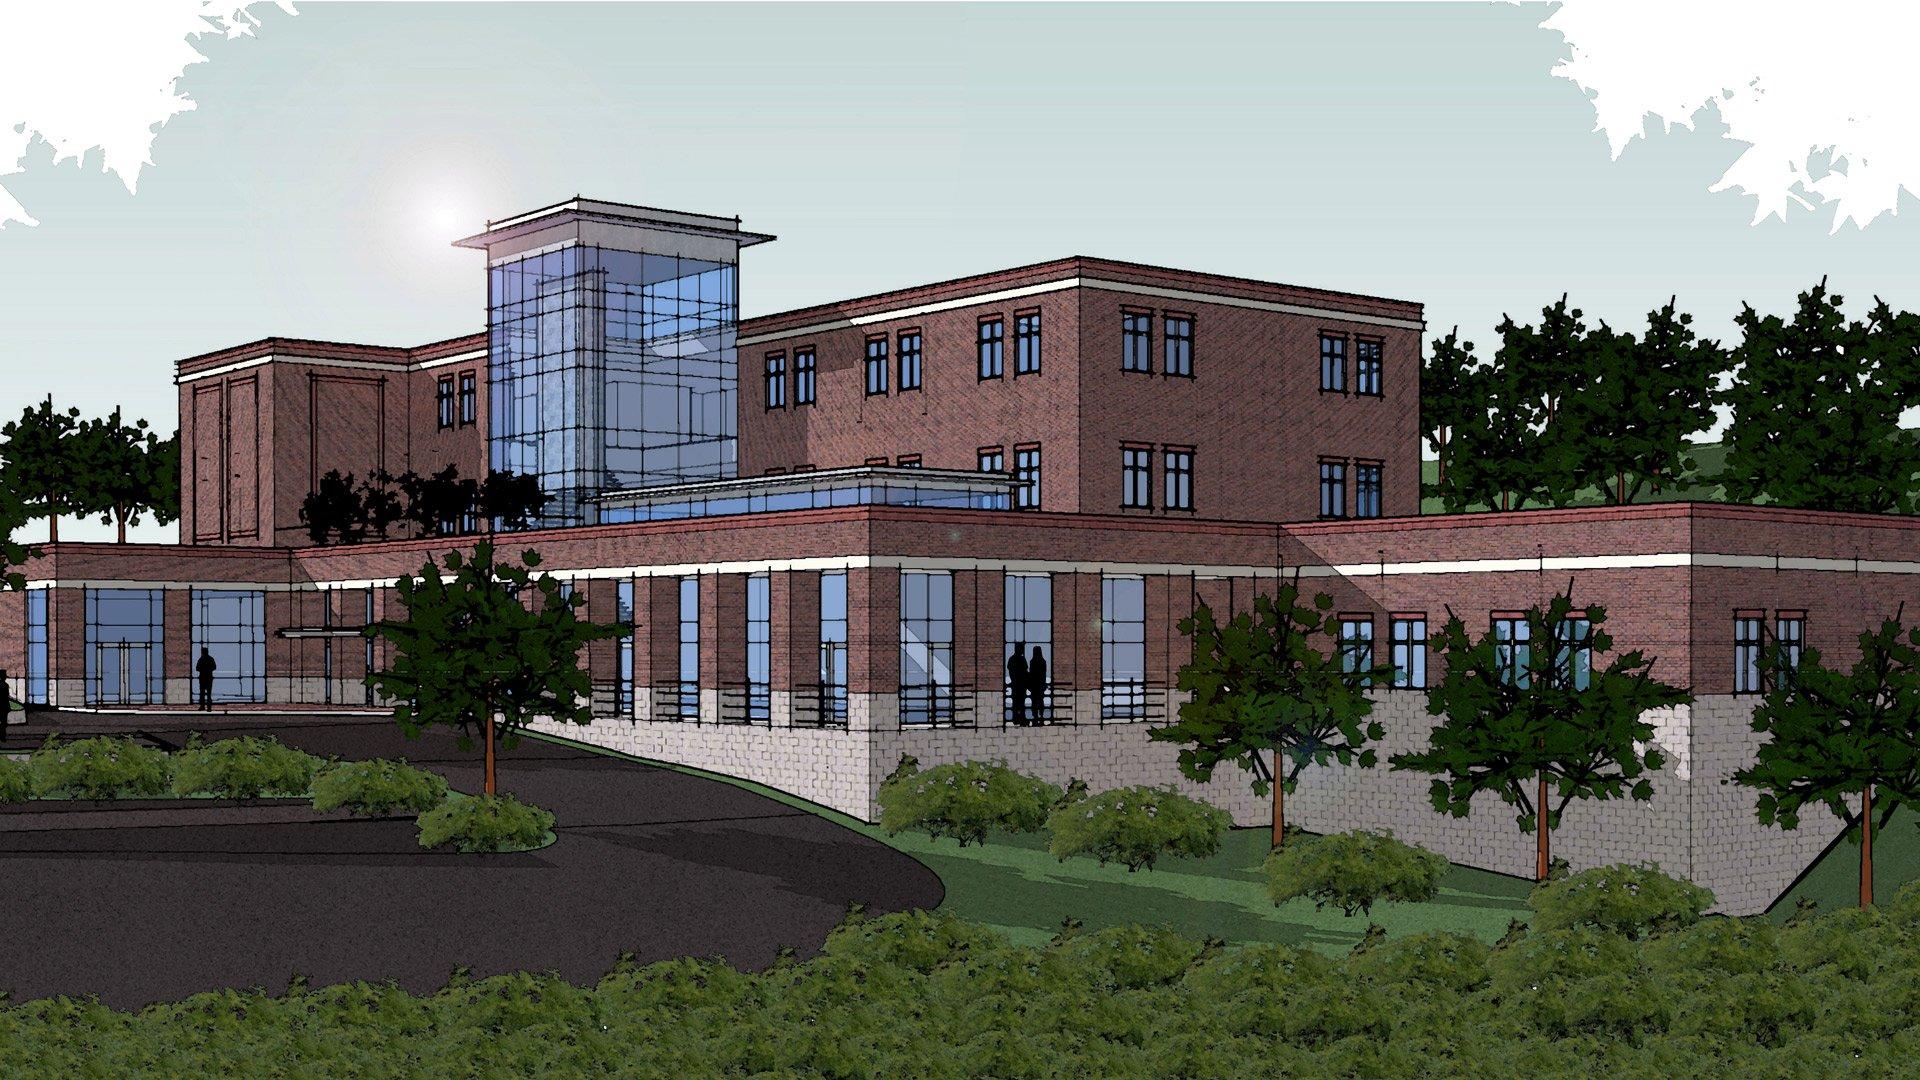 Southwestern Community College Rendering